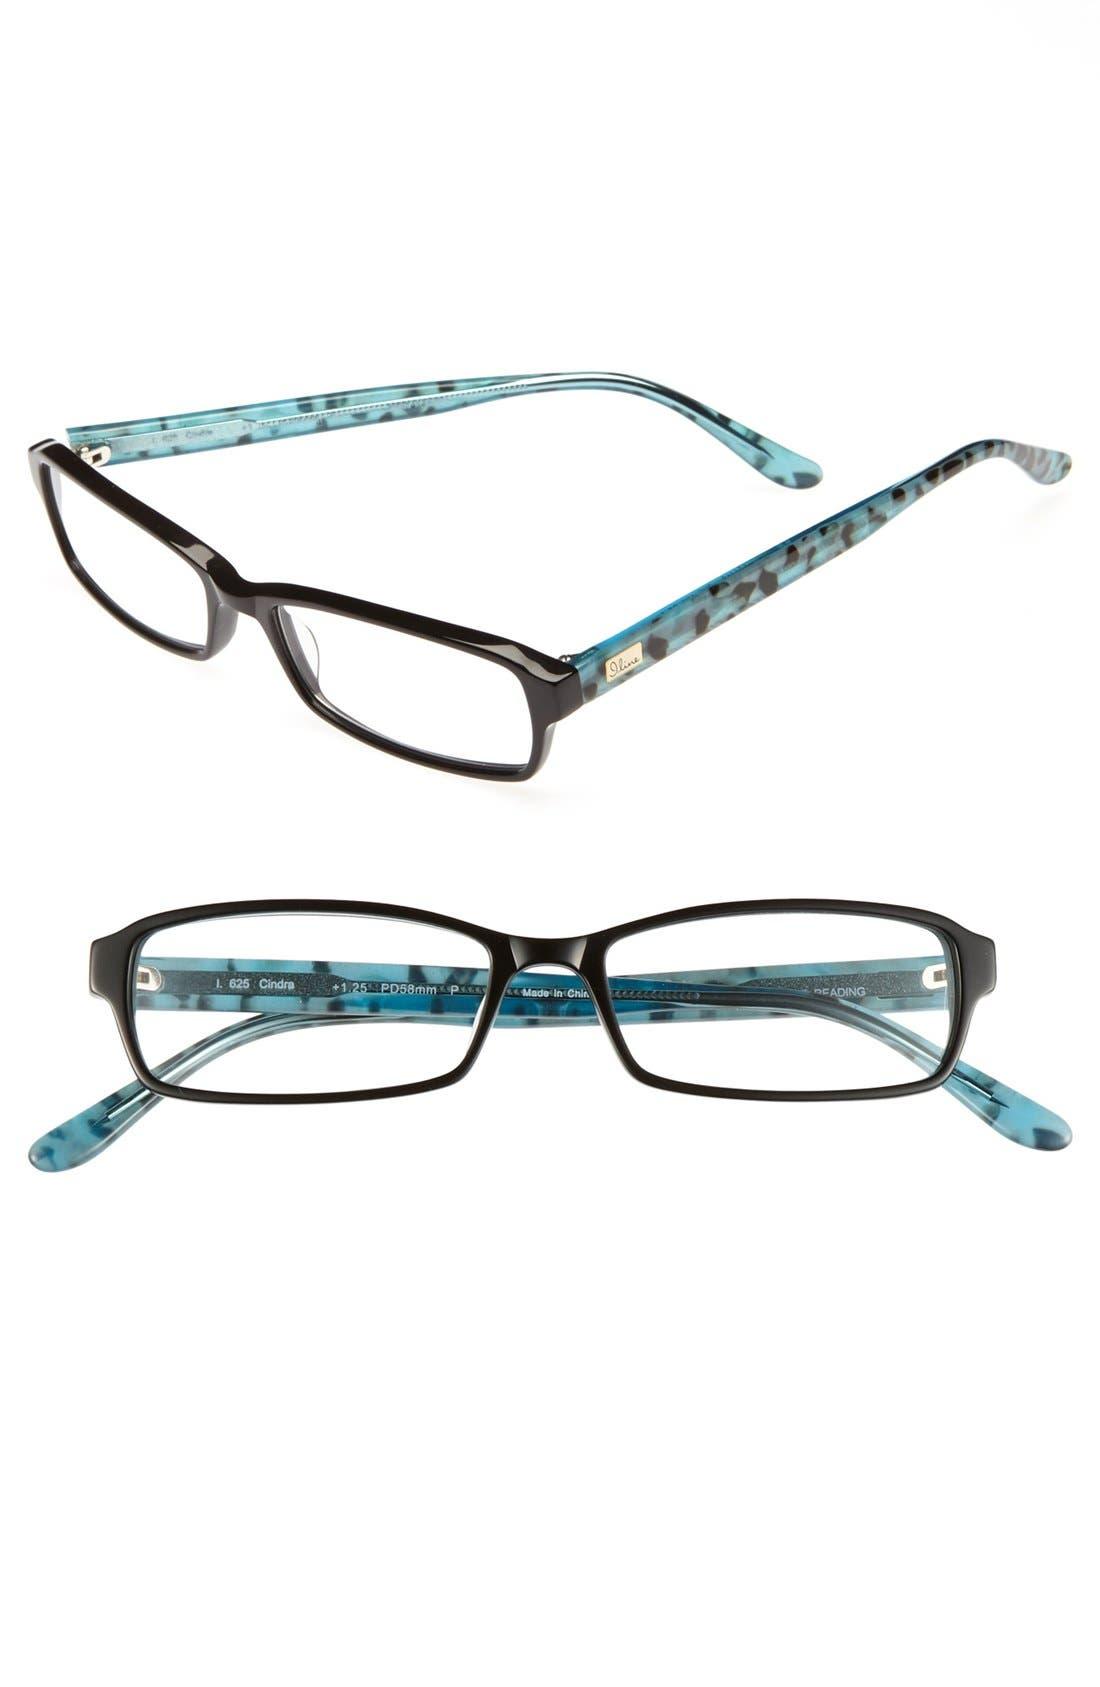 Alternate Image 1 Selected - I Line Eyewear 'Cindra' 52mm Reading Glasses (2 for $88)